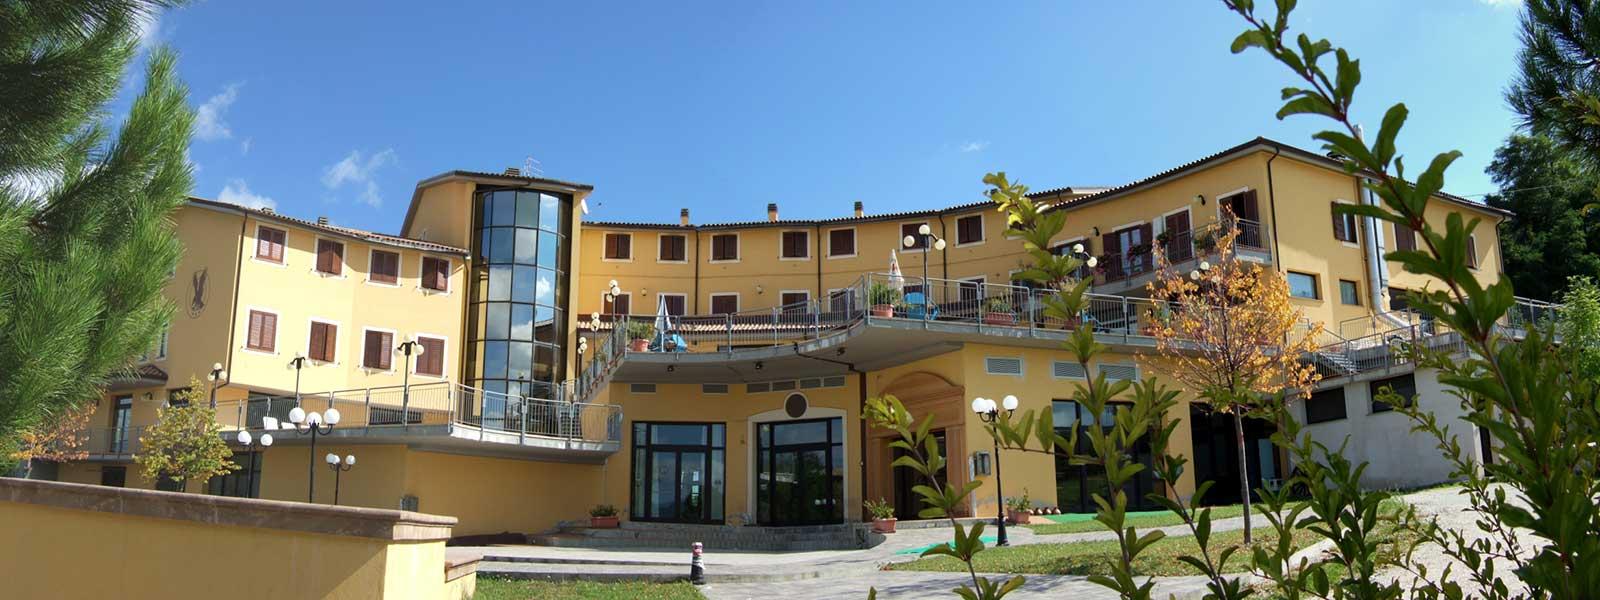 Rimini, ritiro estivo a Sant'Agata Feltria.